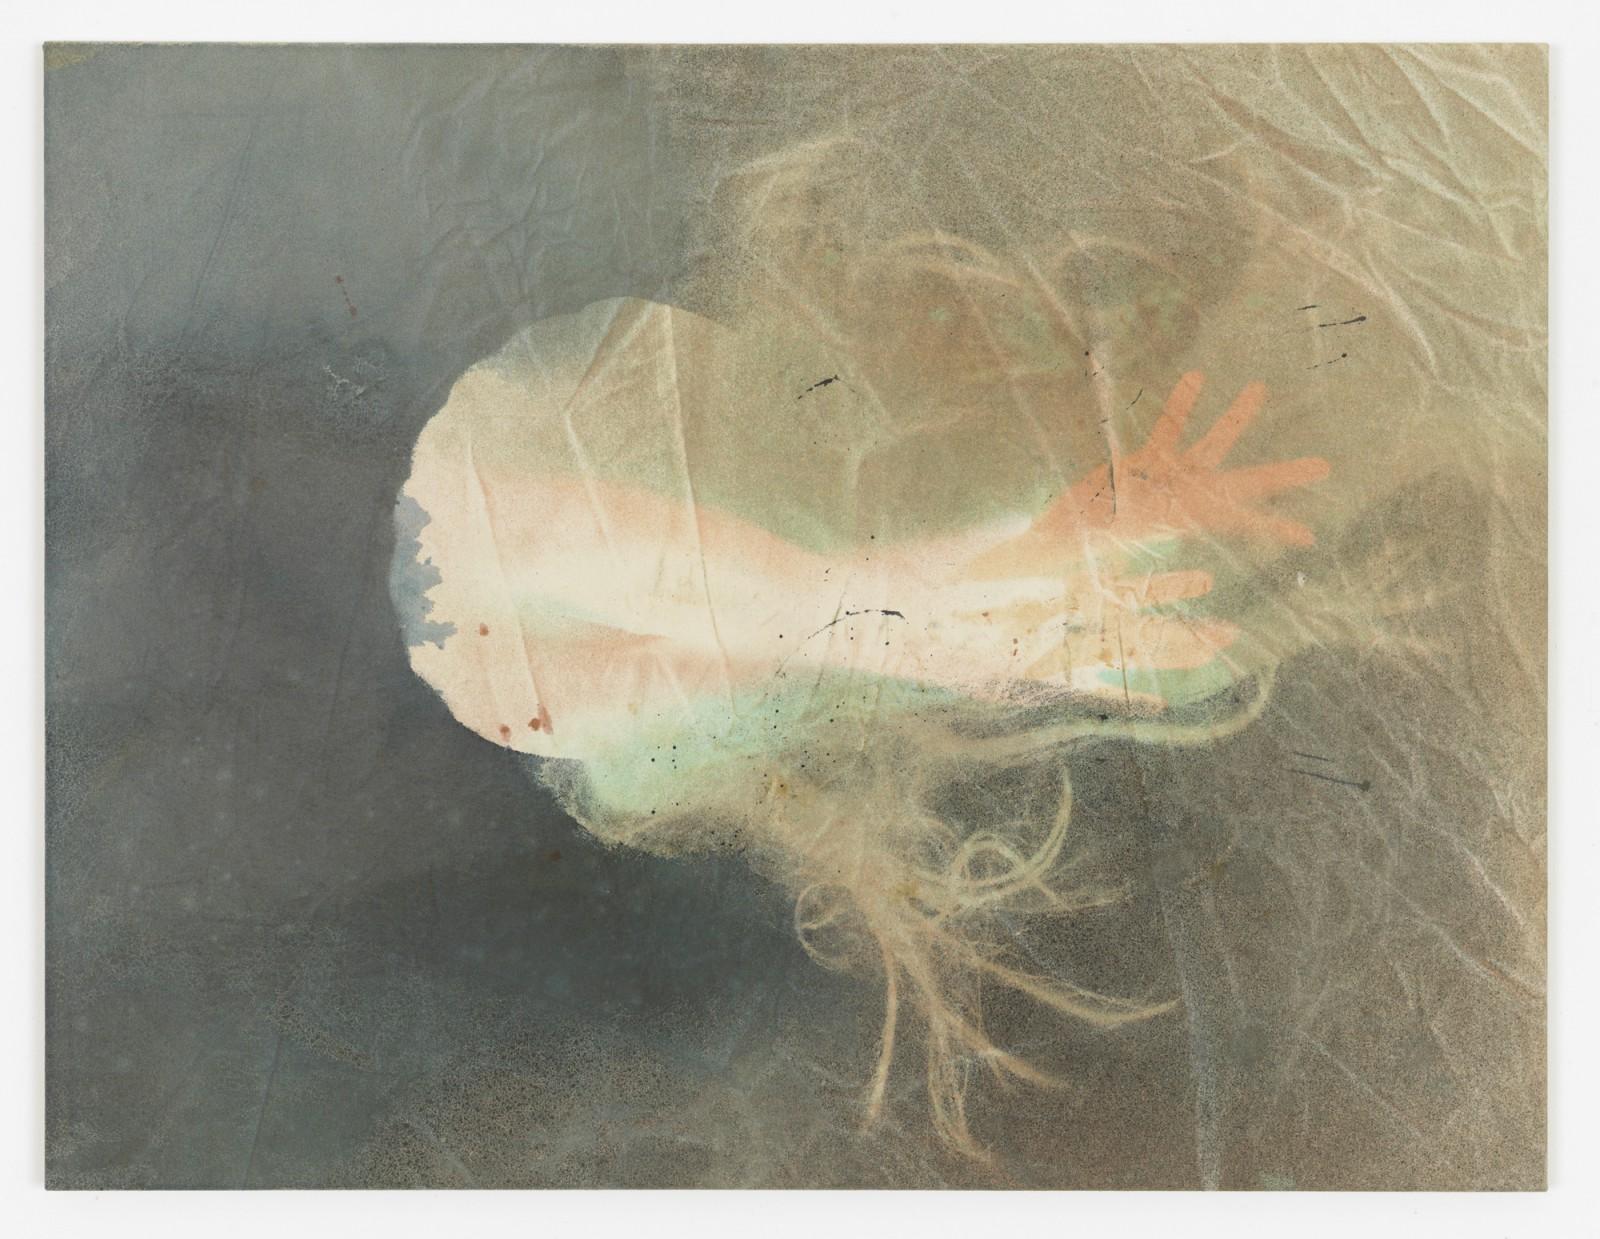 Kim Nekarda: untitled, 2015, vinyl color & body print on cotton, 80 x 105 cm